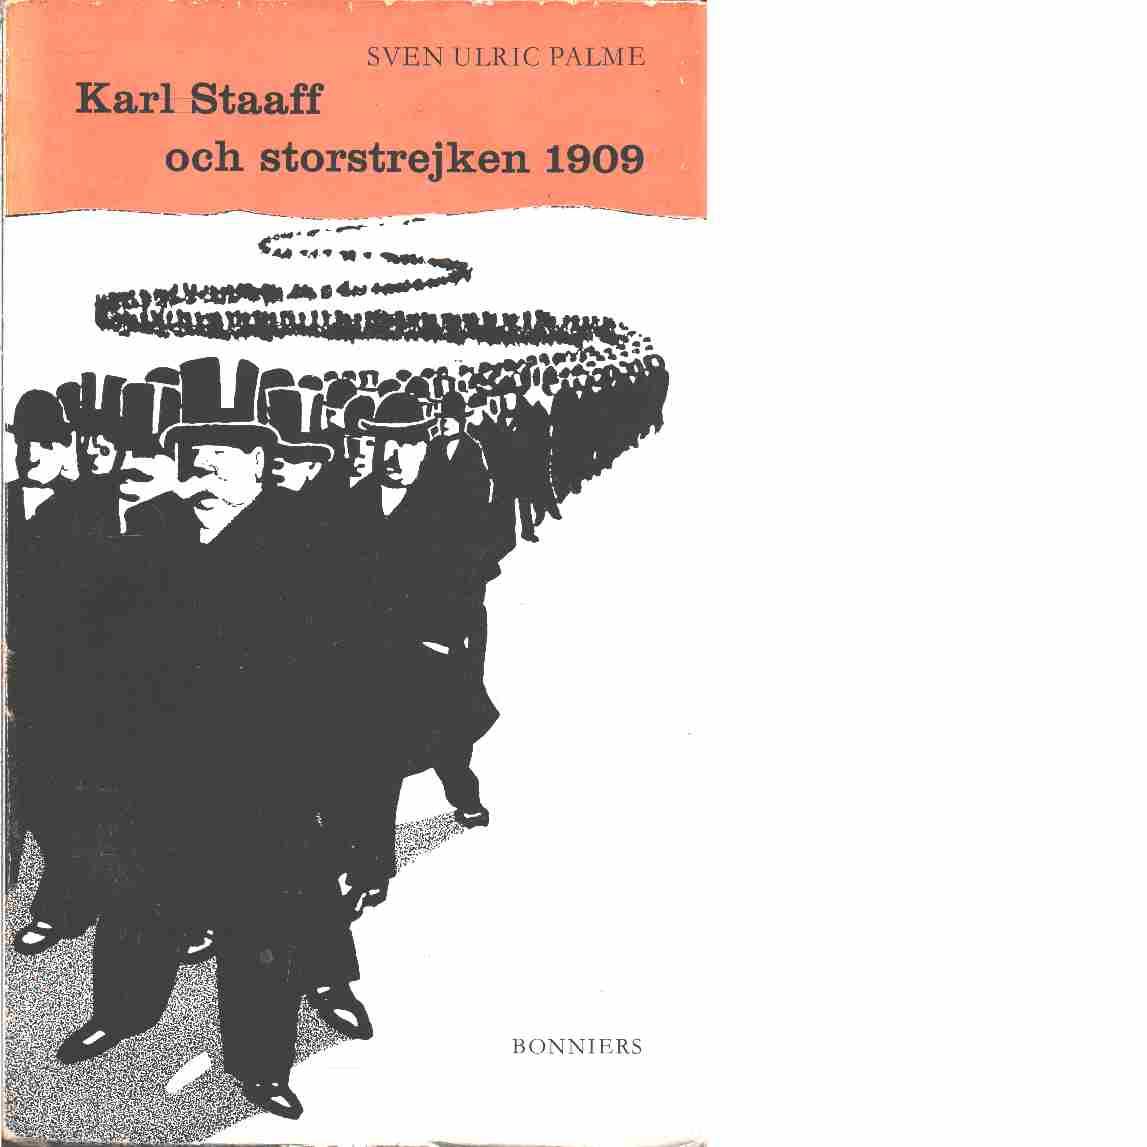 Karl Staaff och storstrejken 1909 - Palme, Sven Ulric